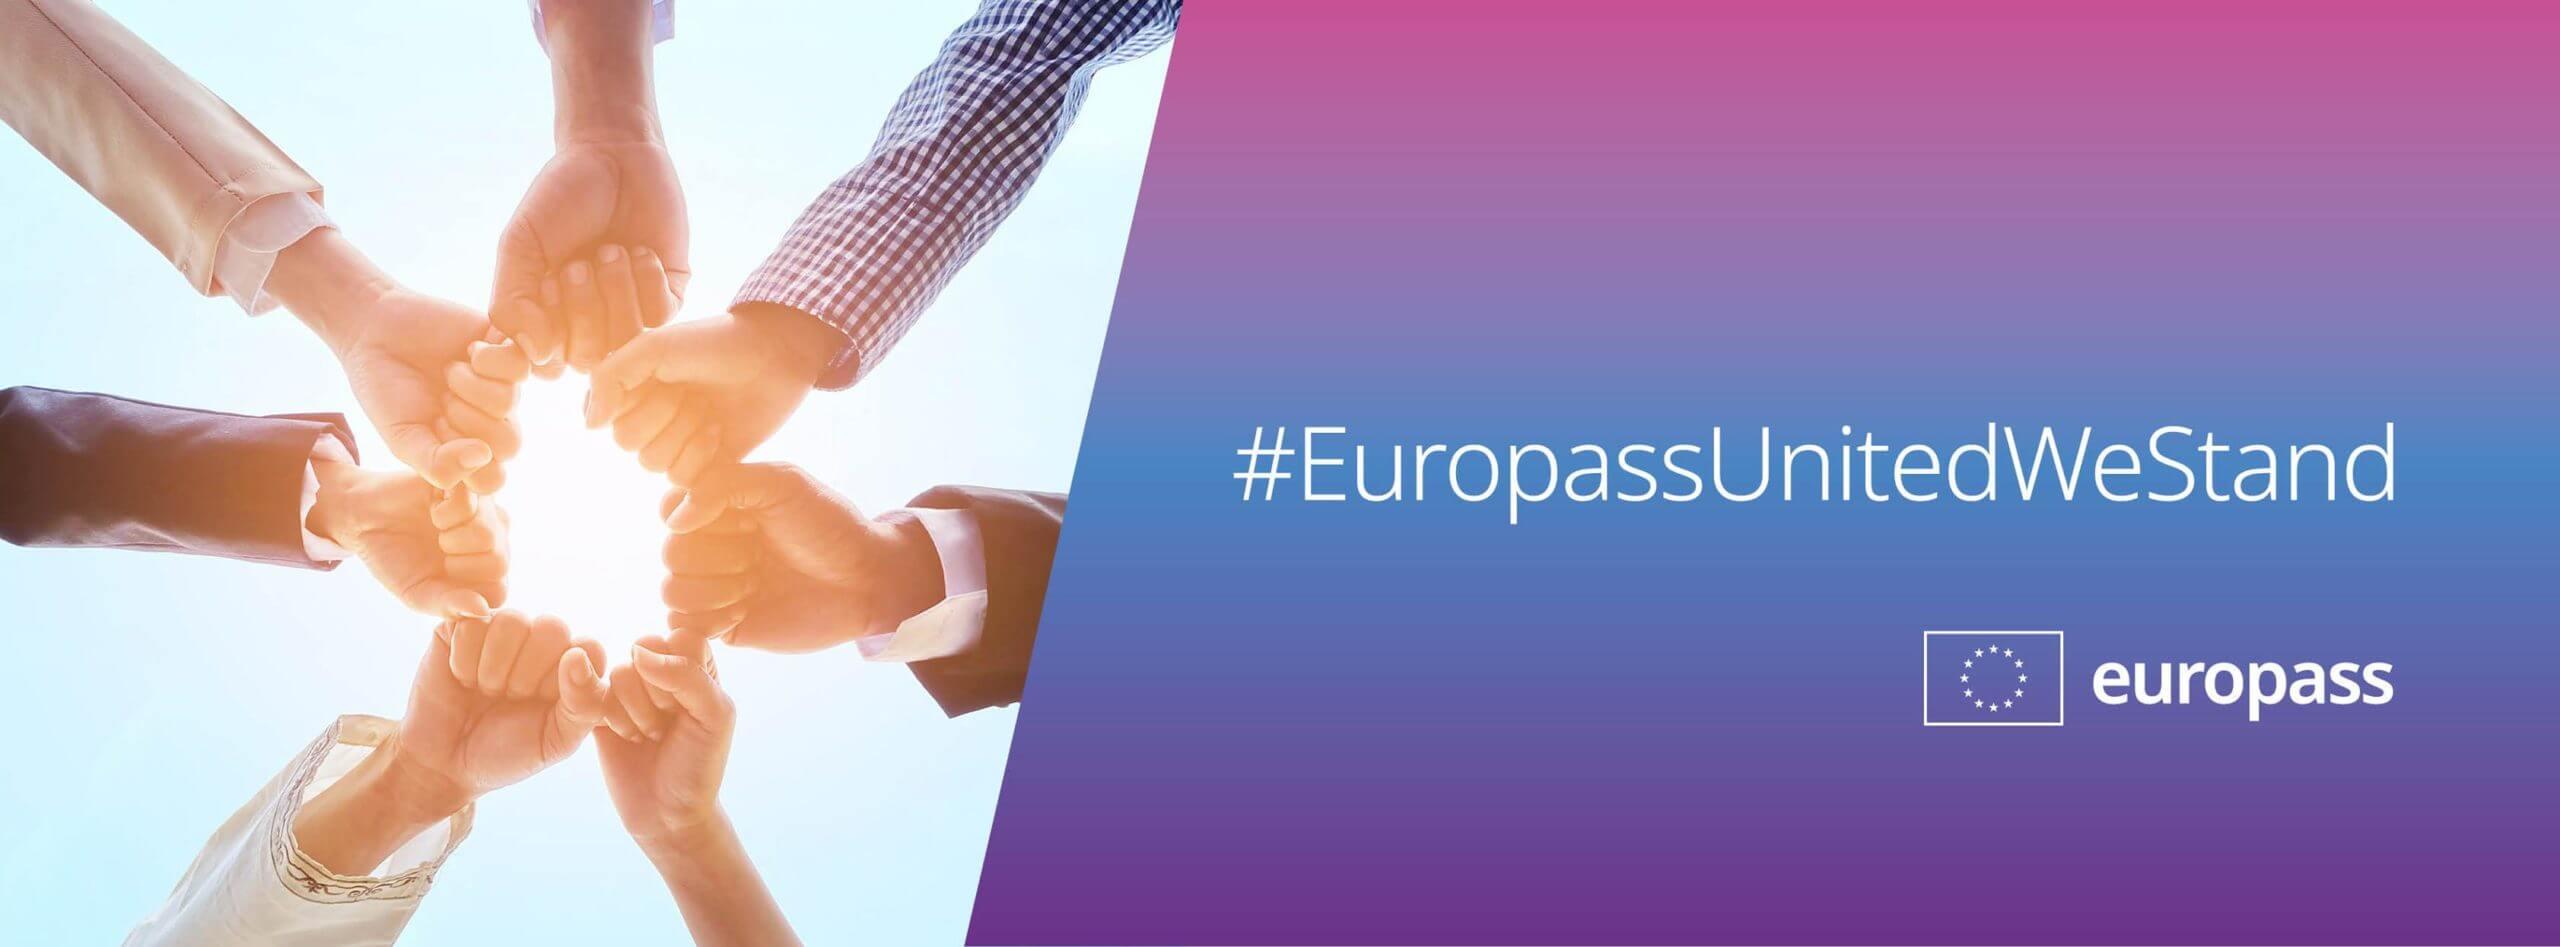 Europass United We Stand